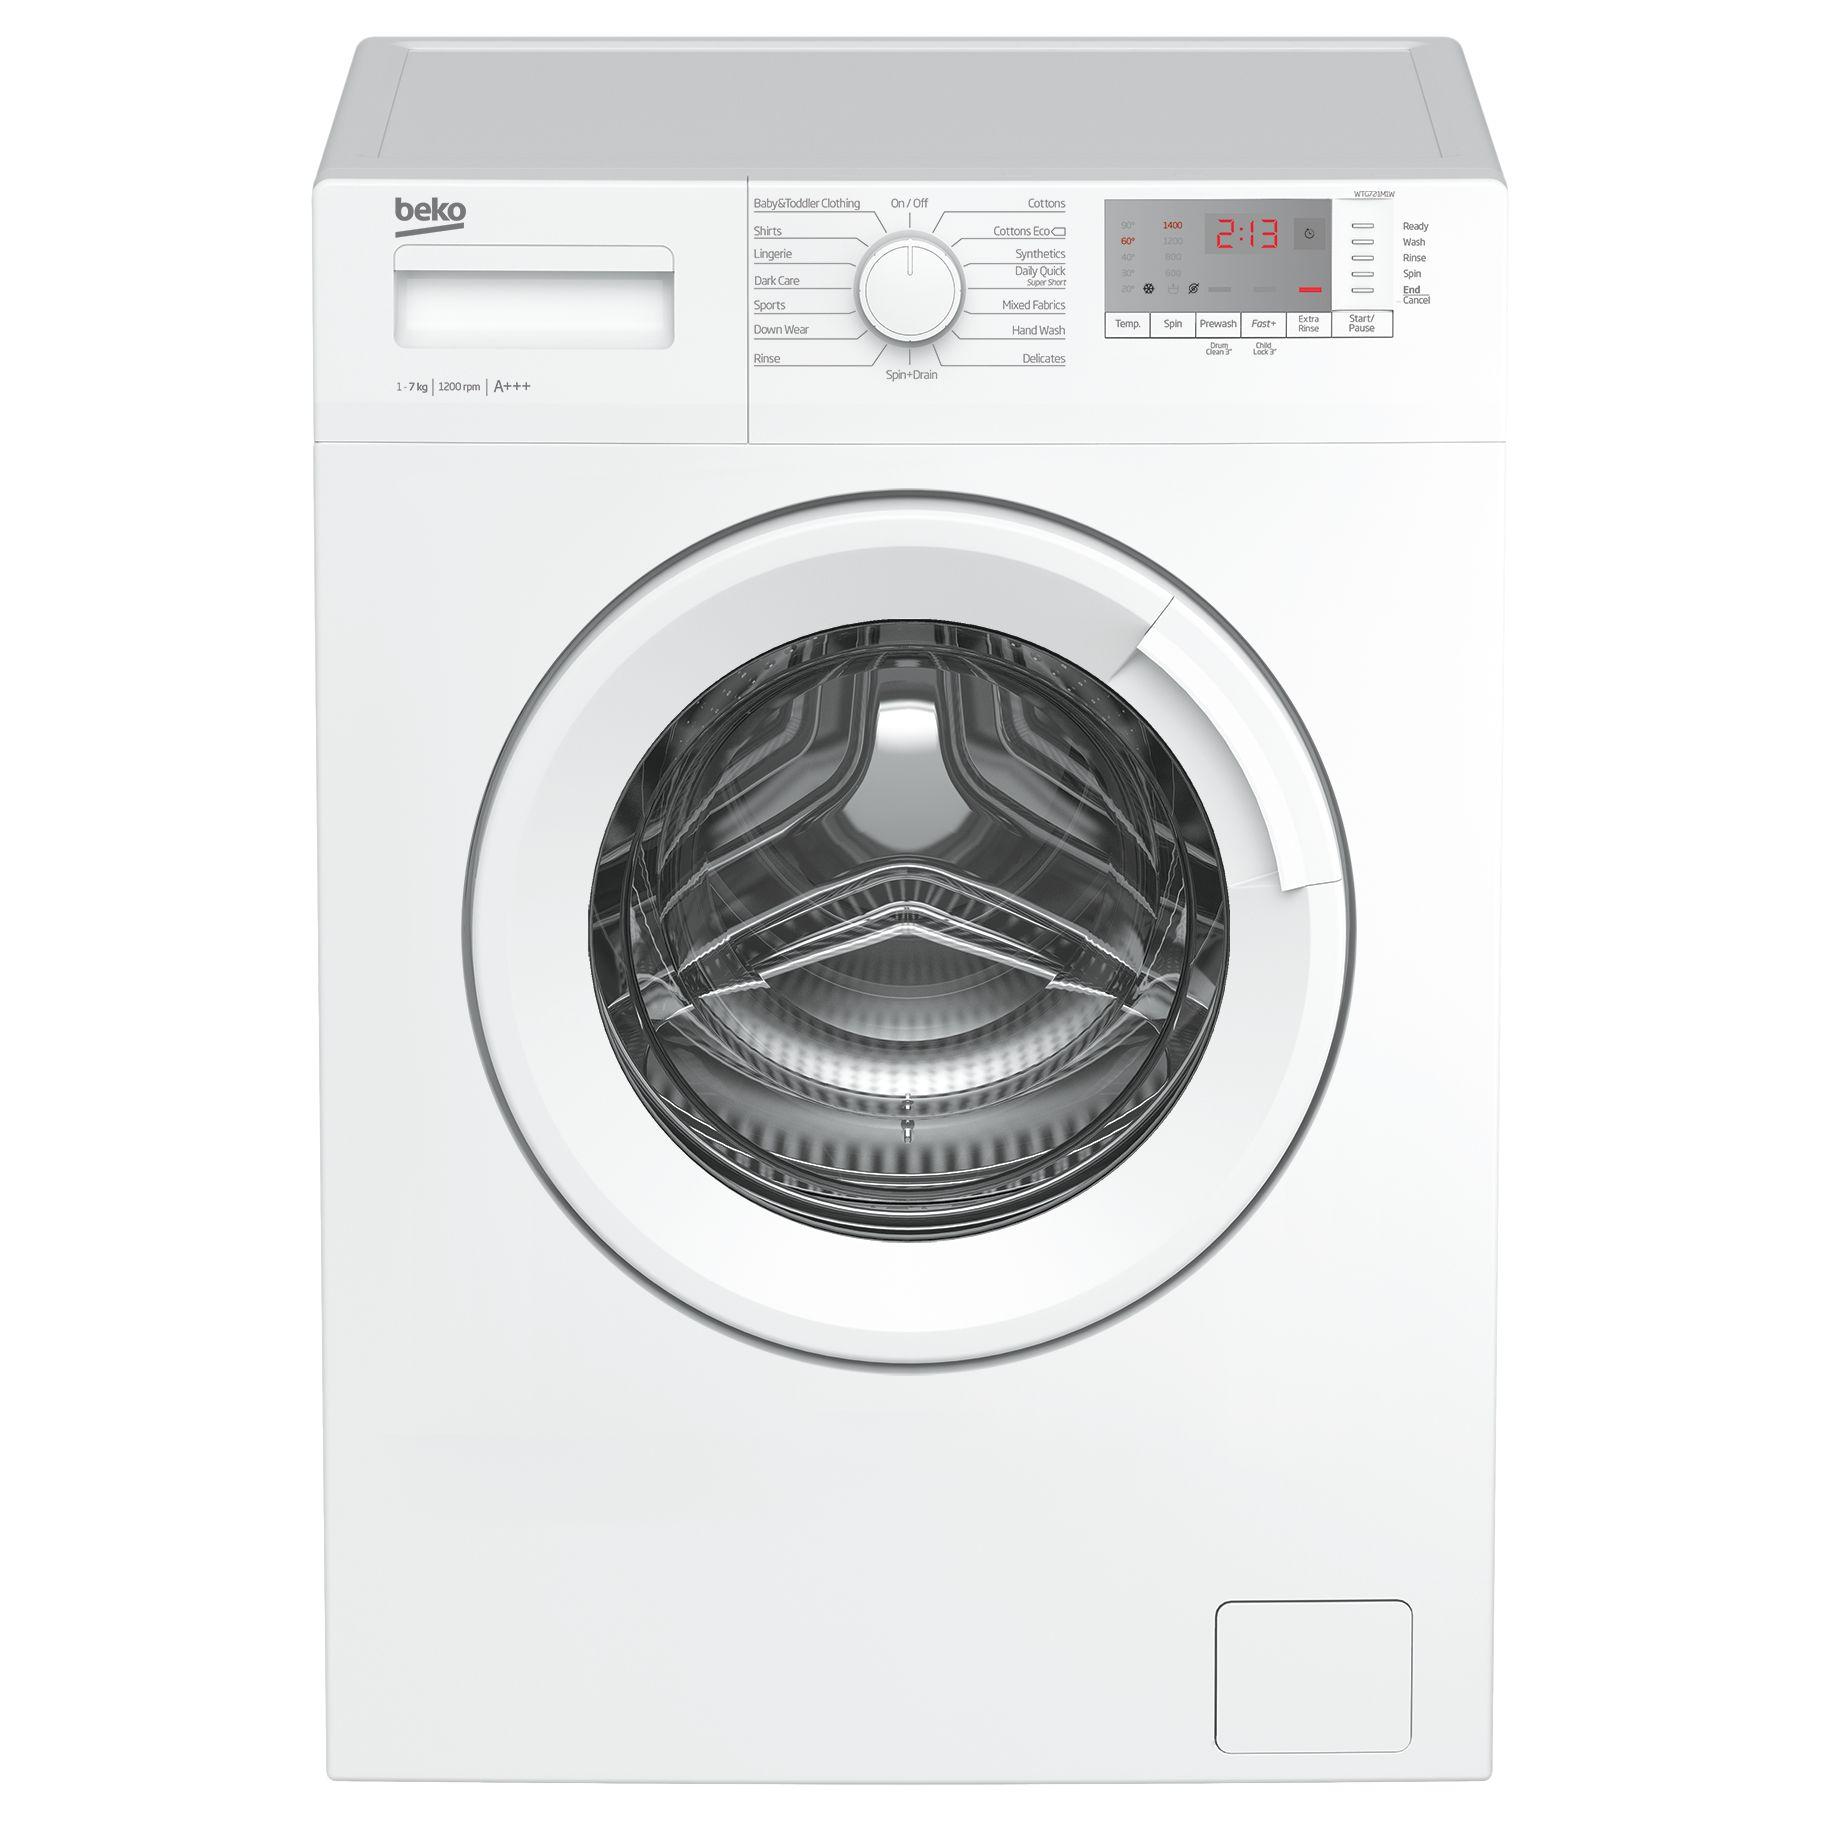 Beko Beko WTG721M1W Freestanding Washing Machine, 7kg Load, A+++ Energy Rating, 1200rpm Spin, White